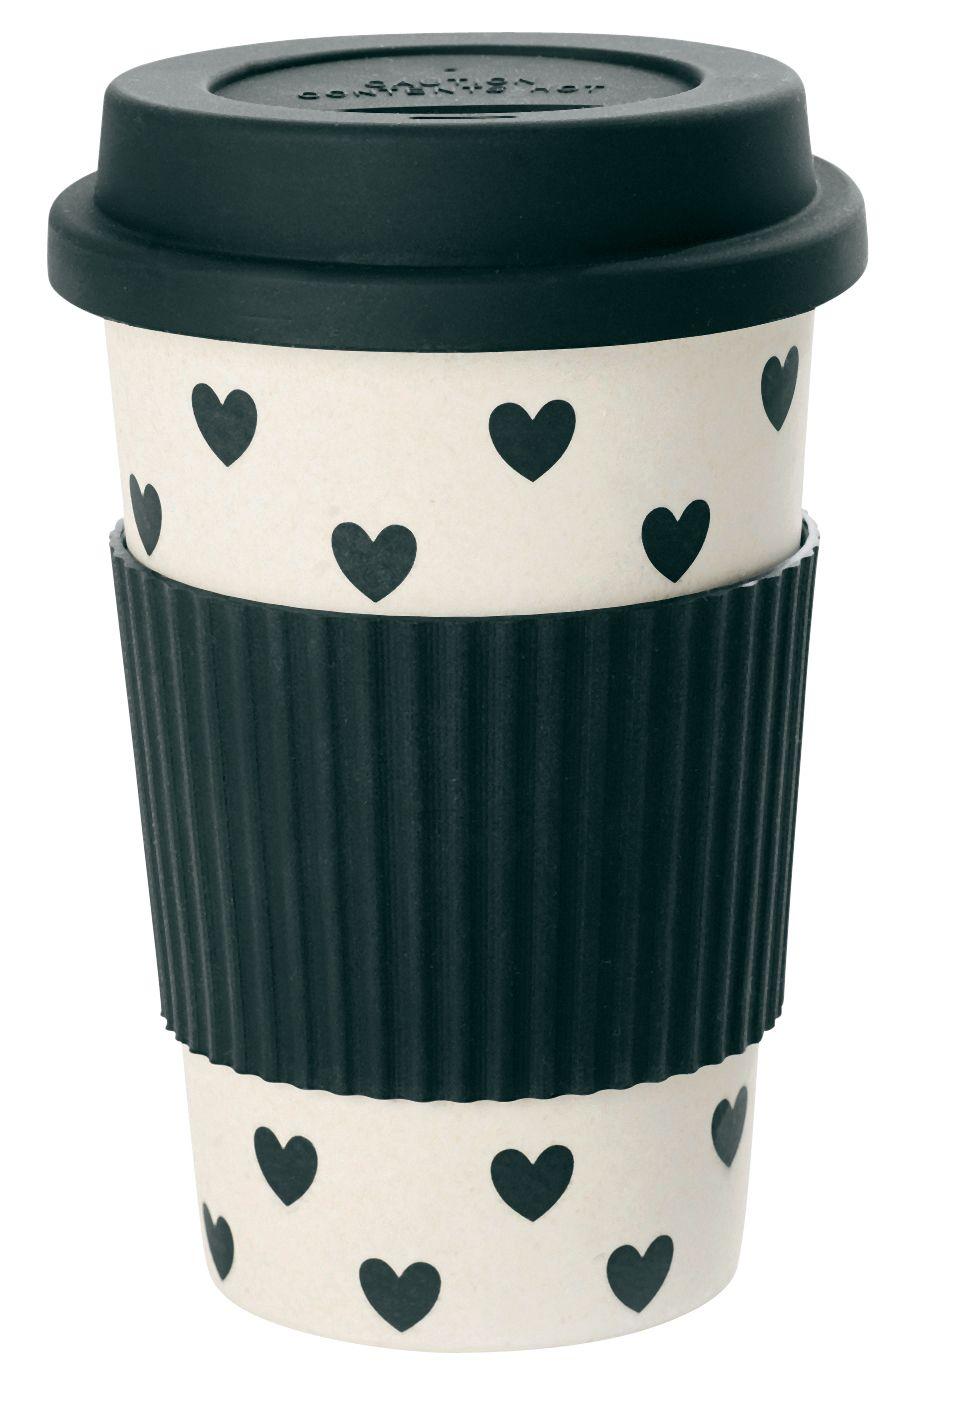 Miss Etoile Travel Mug Bamboo Melamine Black Hearts Mia